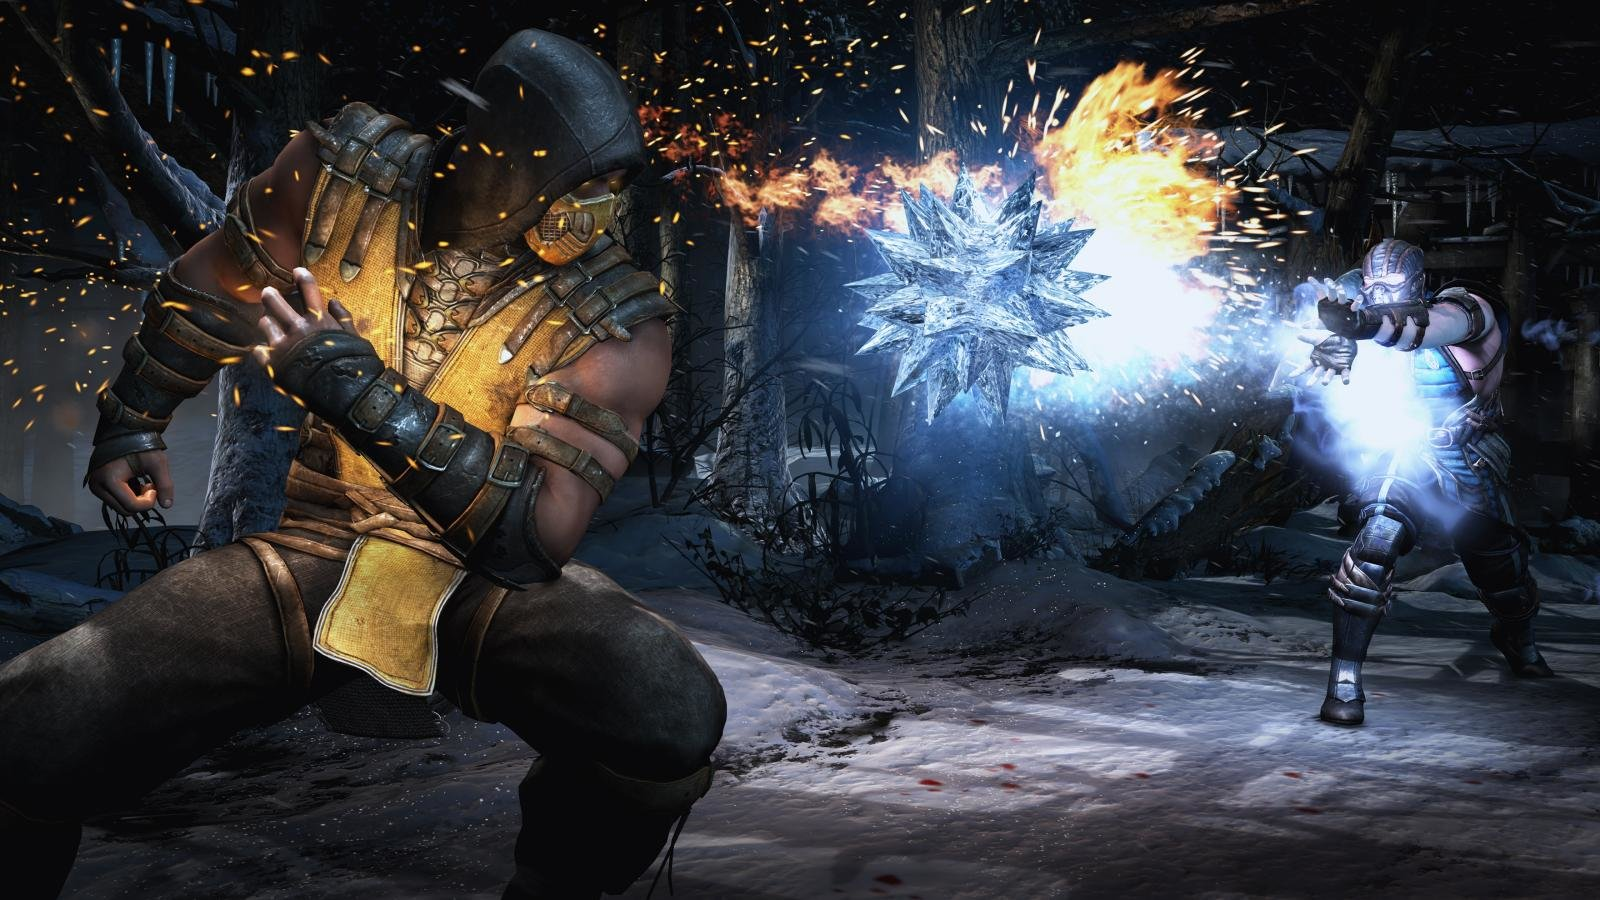 Скидки, Распродажи, PlayStation Store, Ведьмак 3: Дикая Охота, Assassin's Creed: Origins, Far Cry New Dawn, Dark Souls, We Happy Few, Fallout 4, Tom Clancy's The Division 2